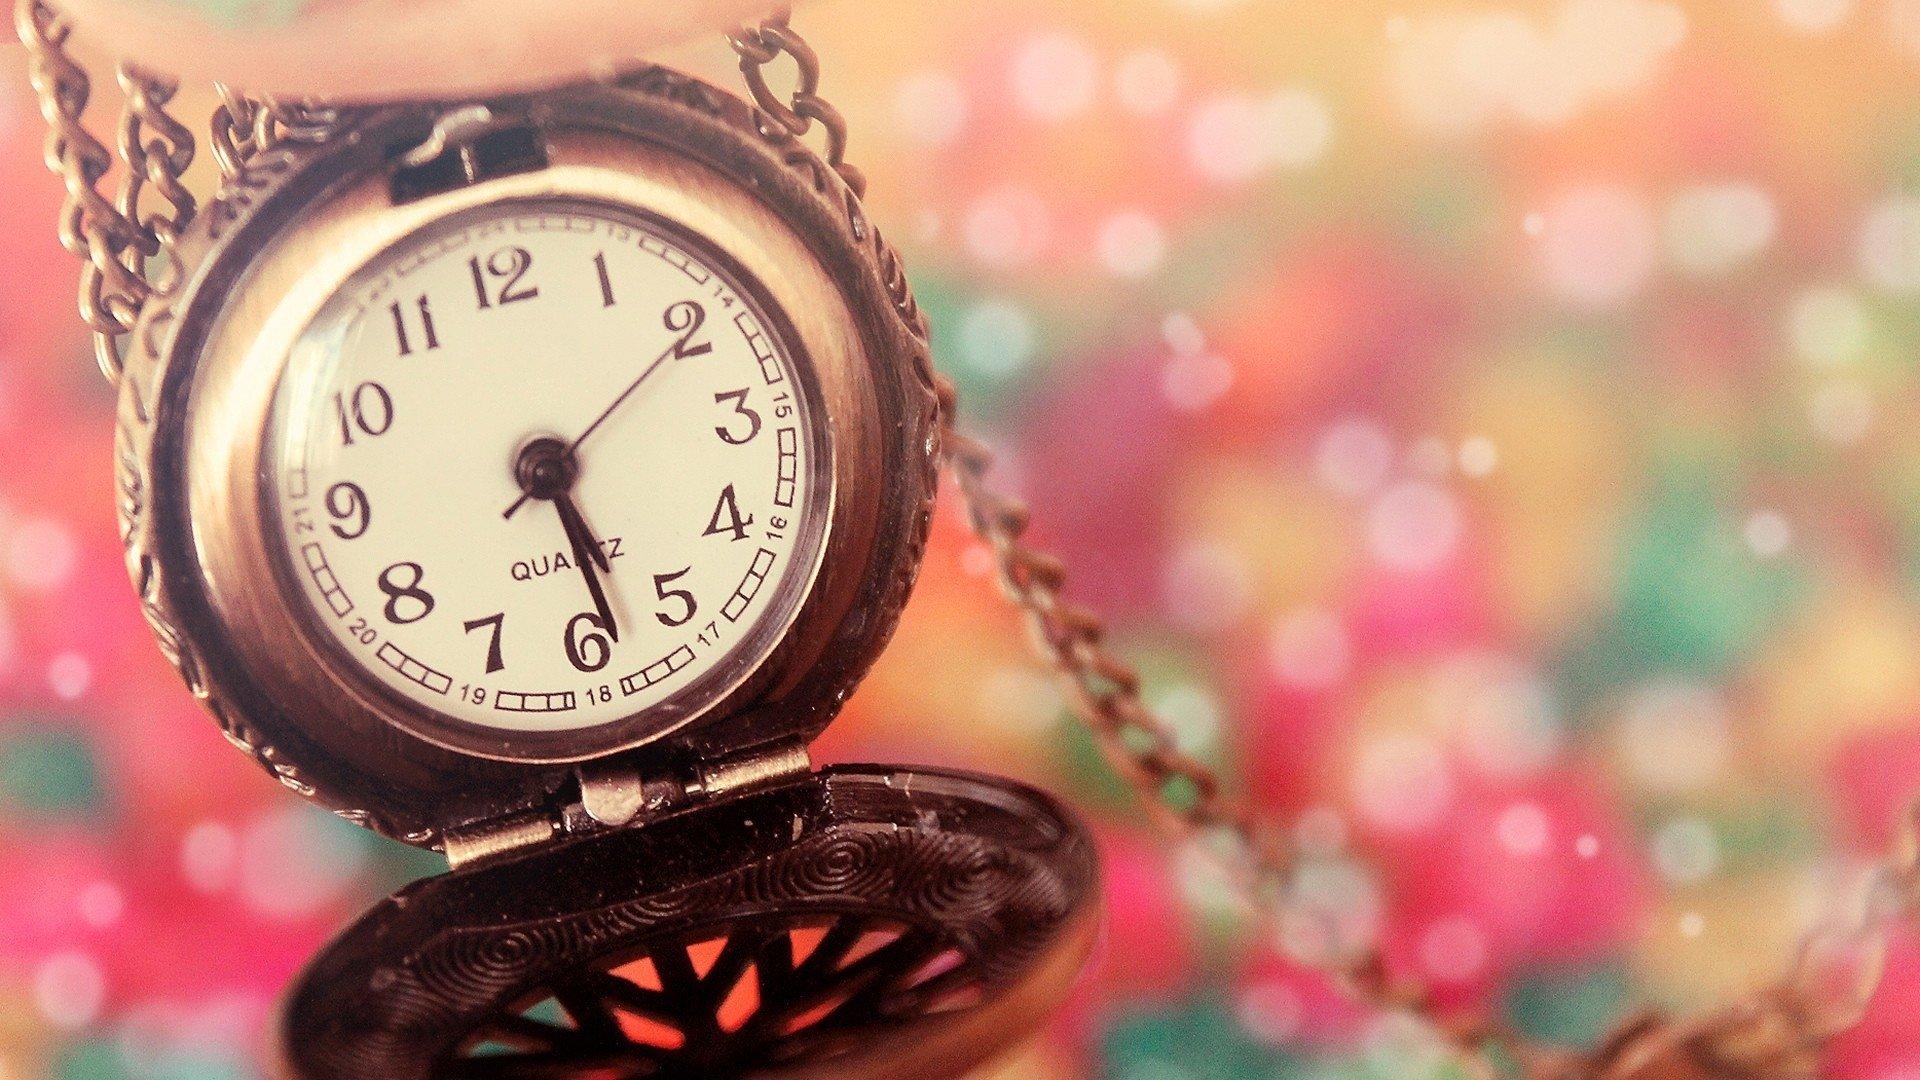 relojes full hd - photo #16